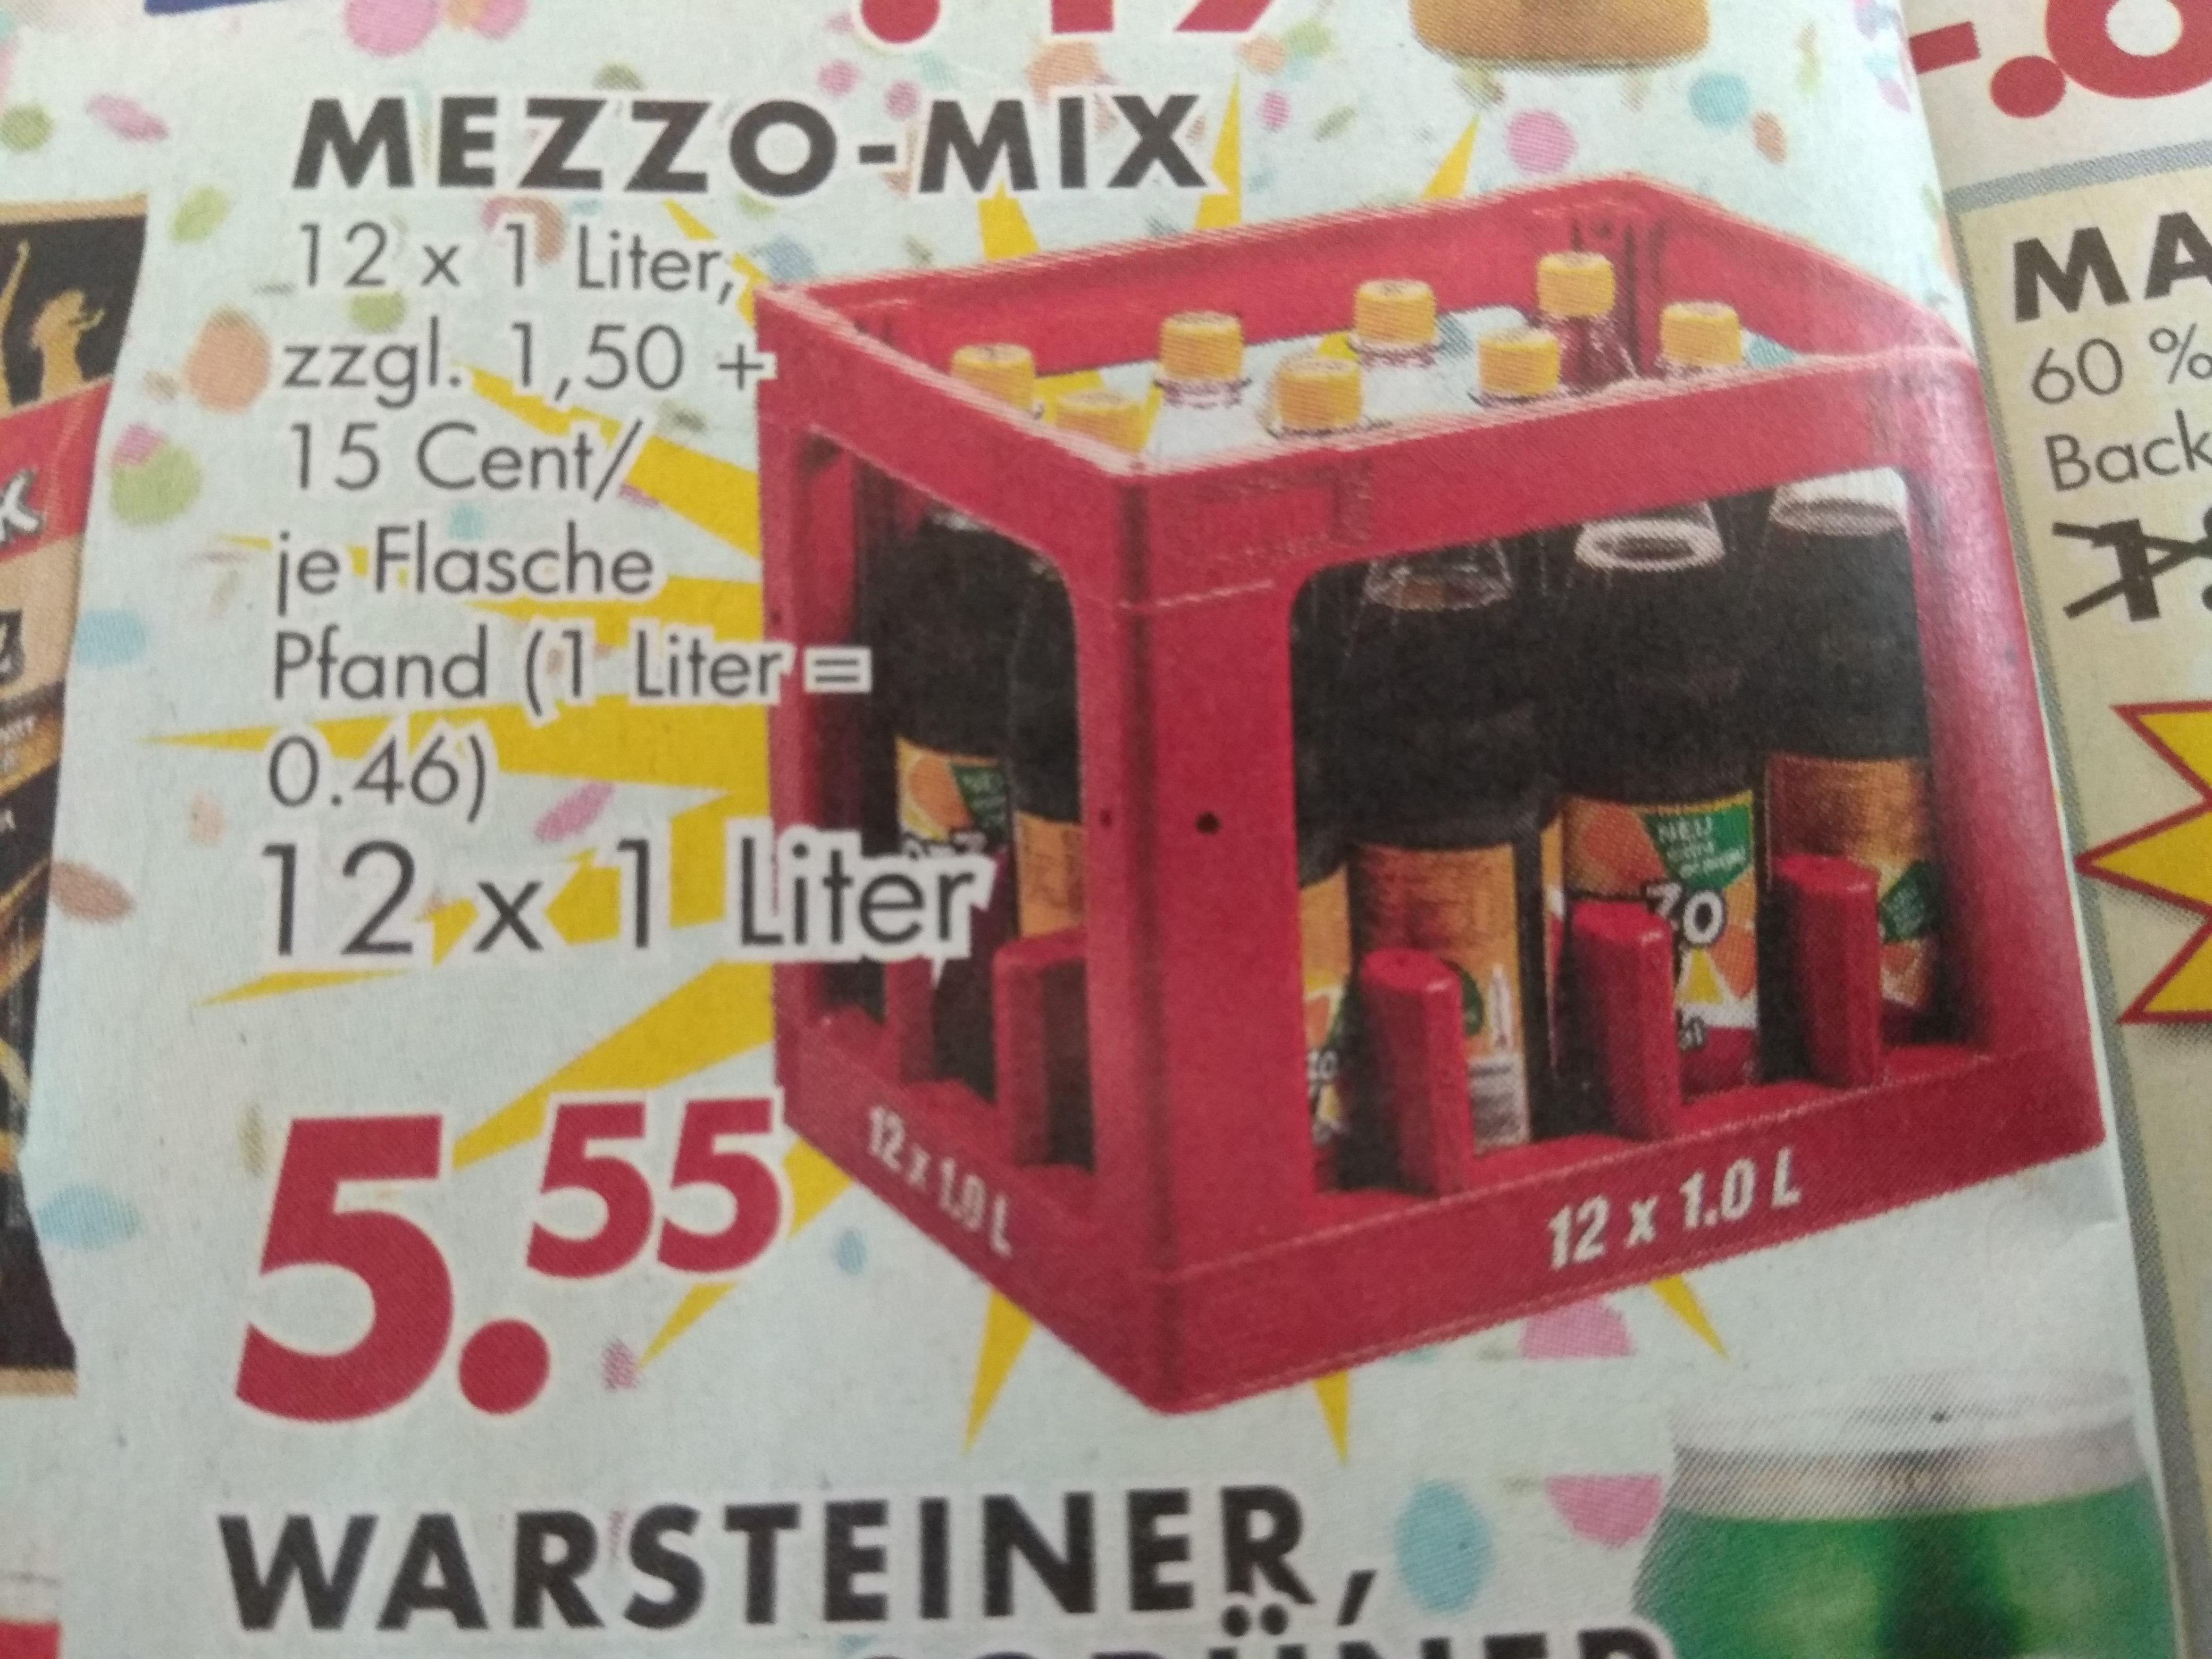 Jawoll Angebote & Deals ⇒ Februar 2018 - mydealz.de